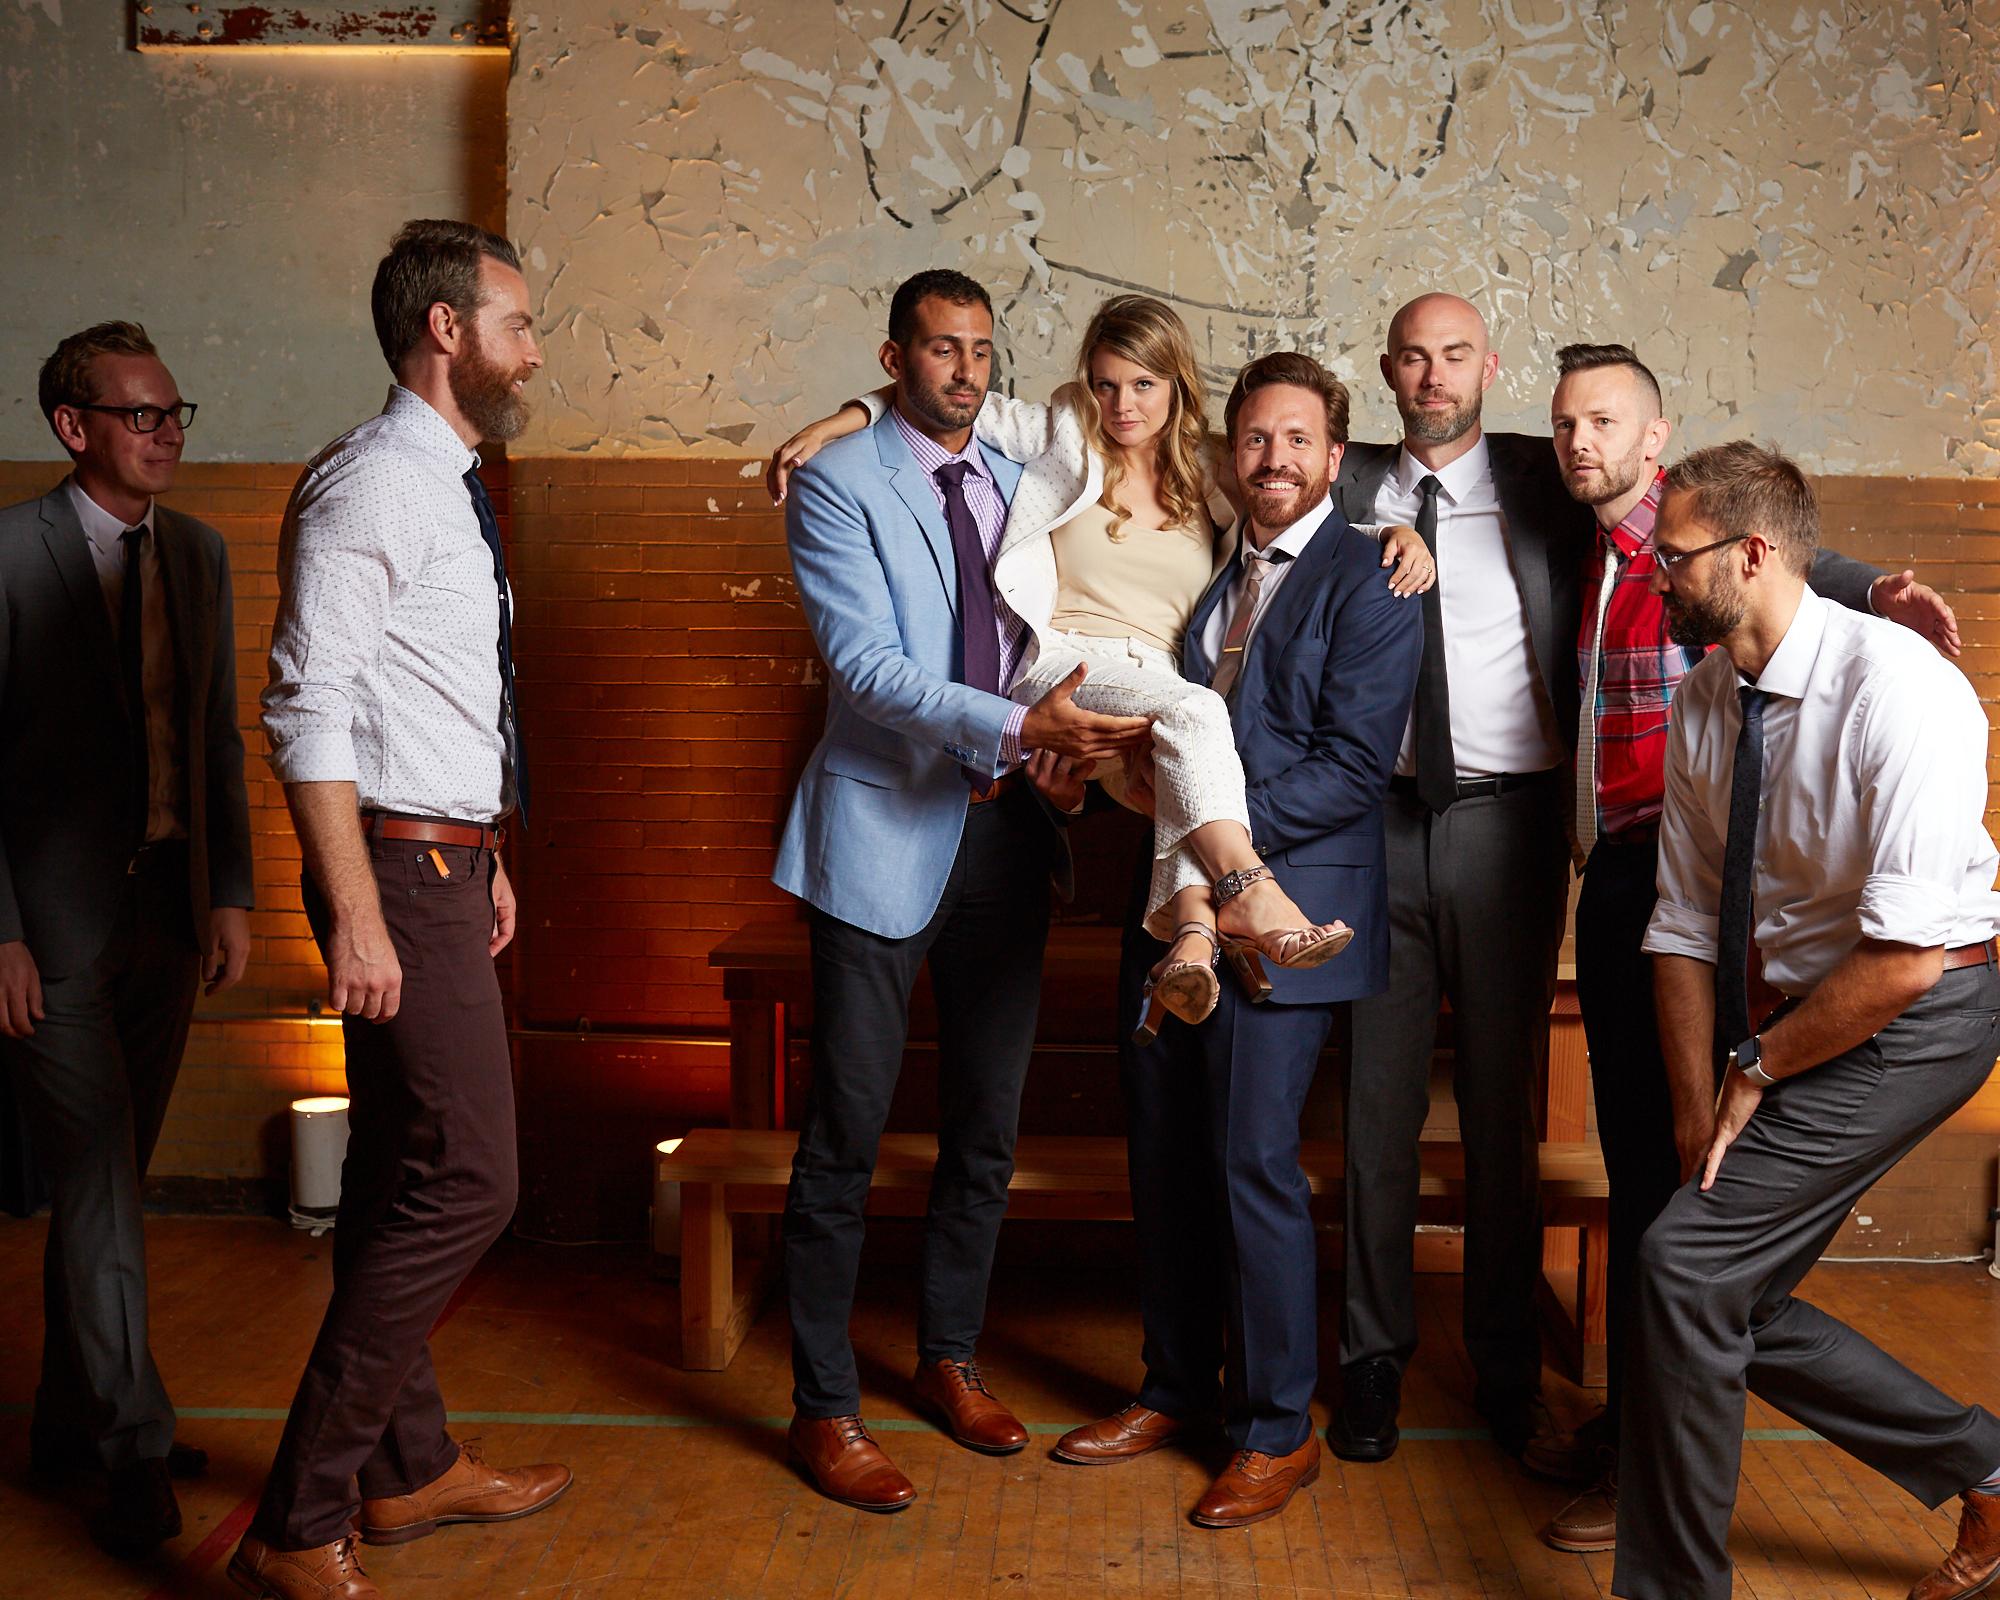 Ryan Hannah Sims - 2017.09 - Wedding Photos - 1116.jpg